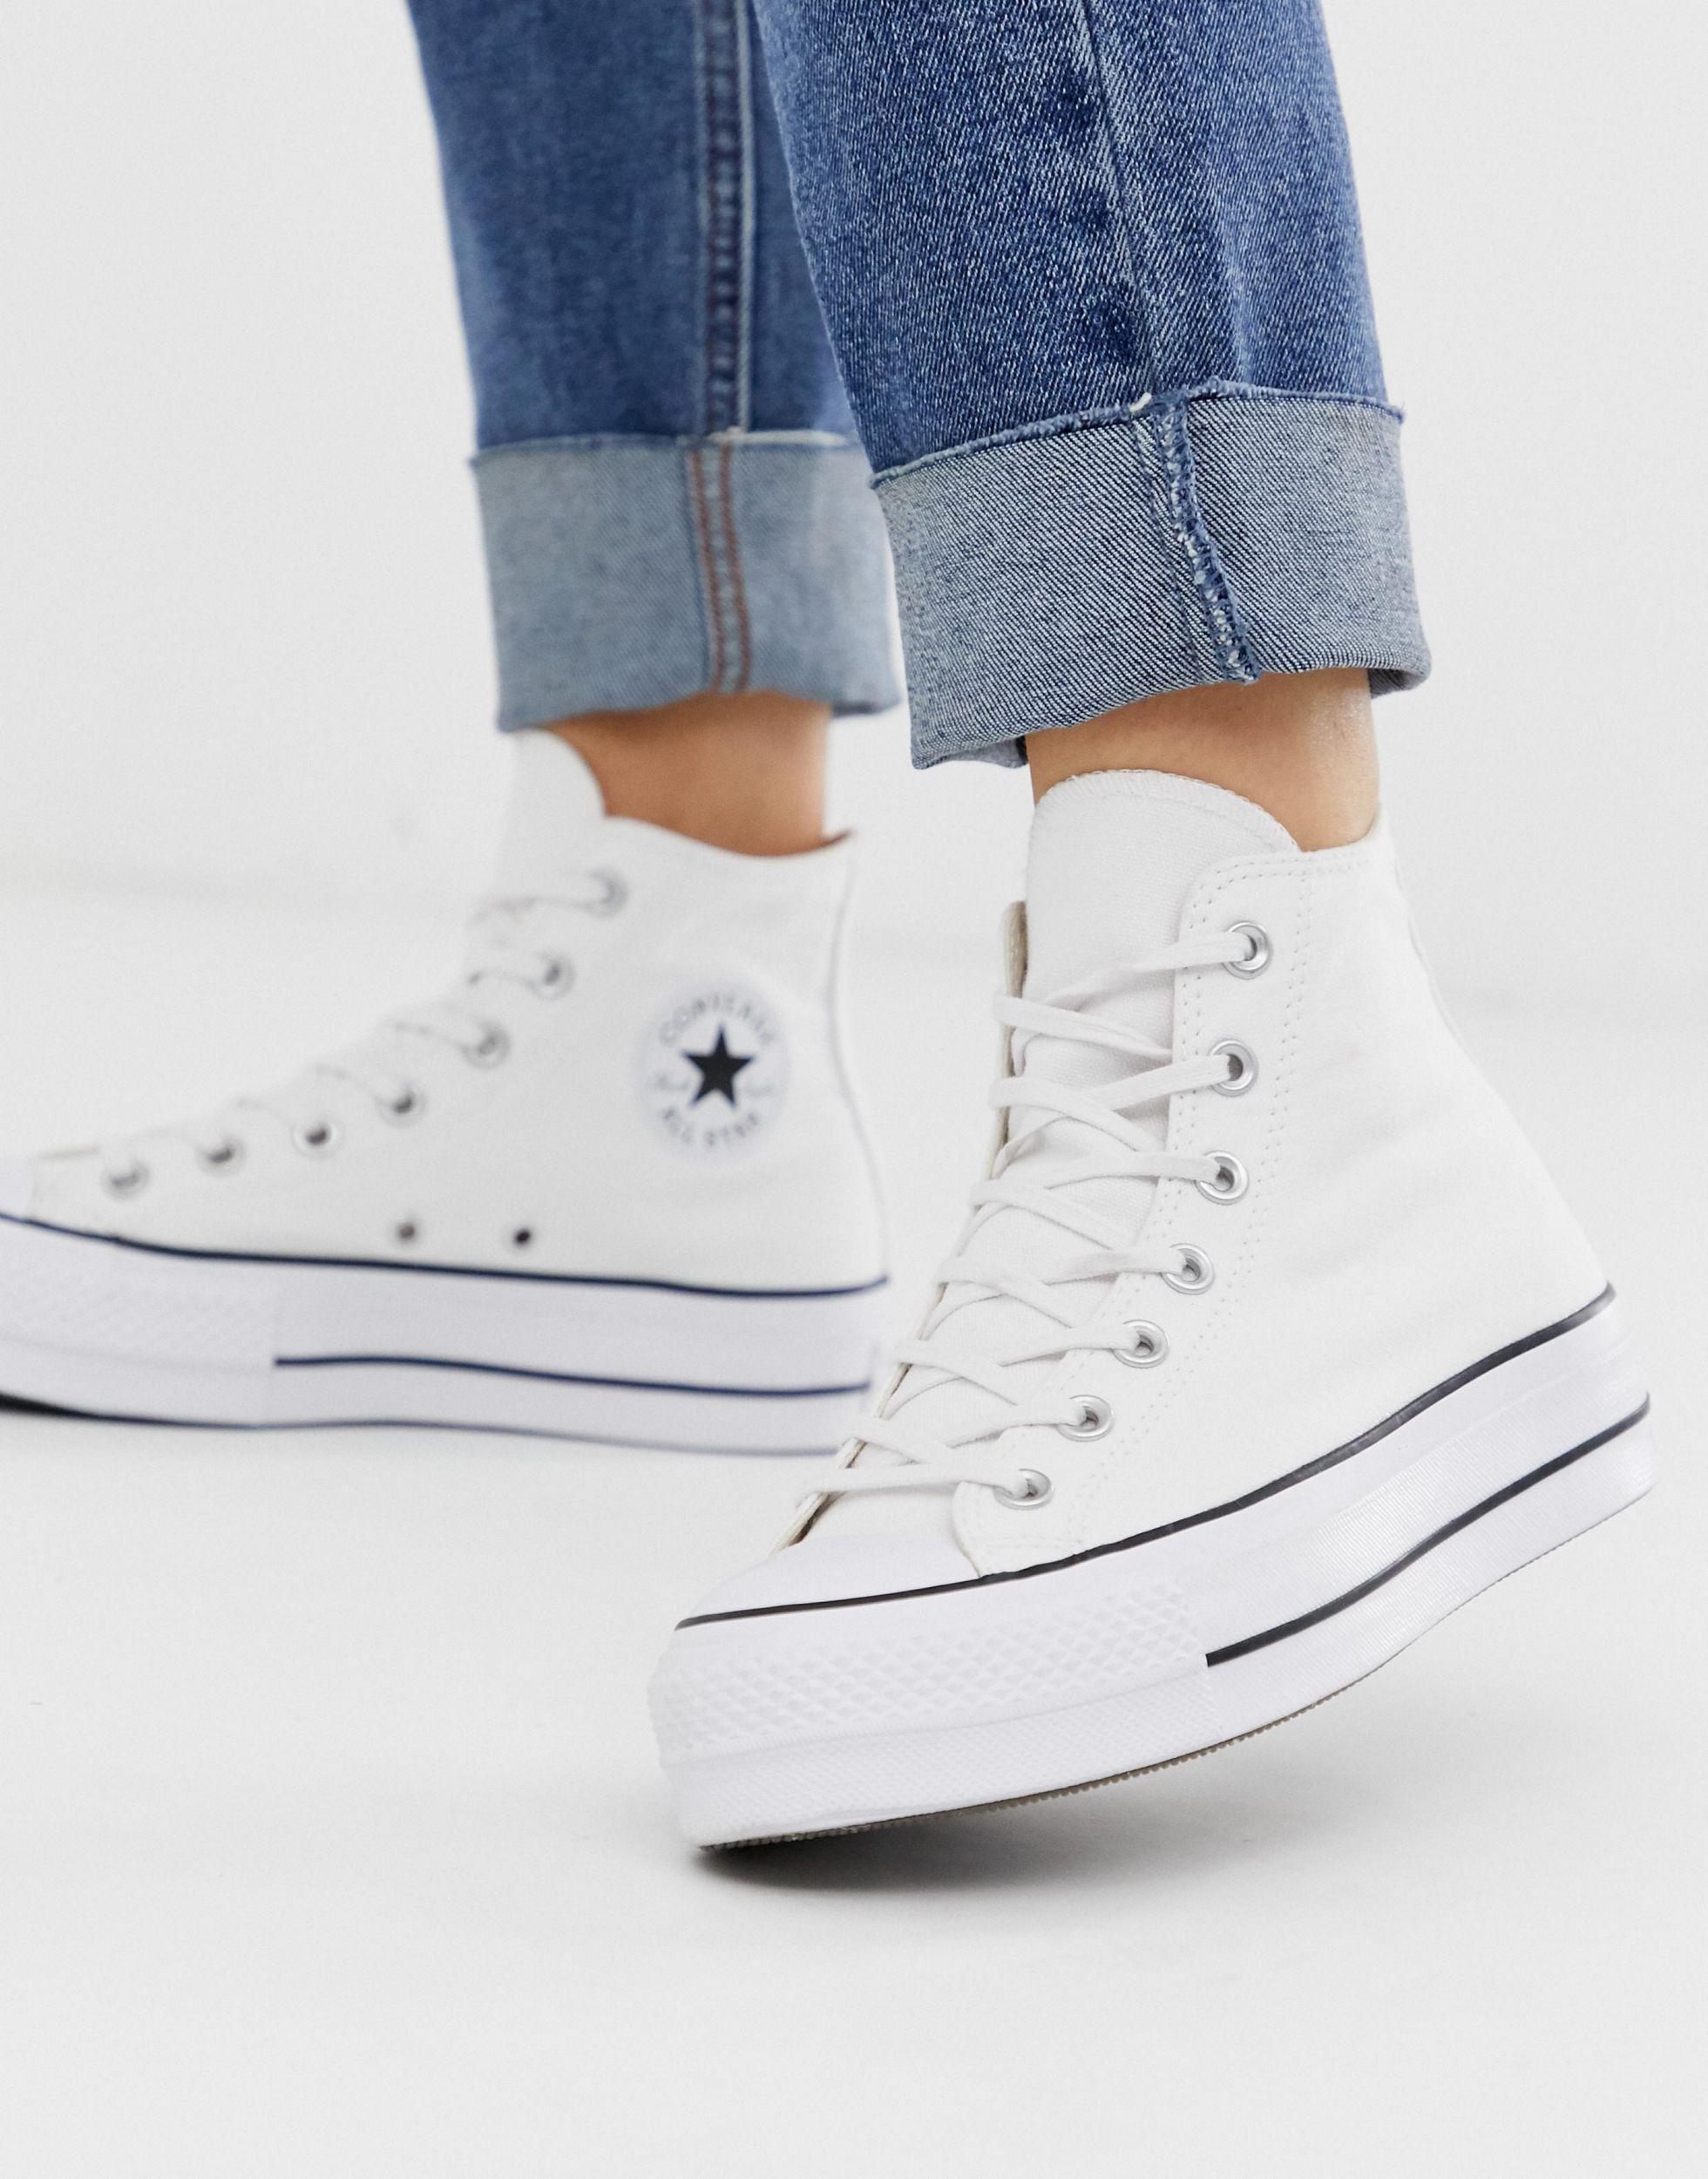 converse white platform trainers Shop Clothing & Shoes Online